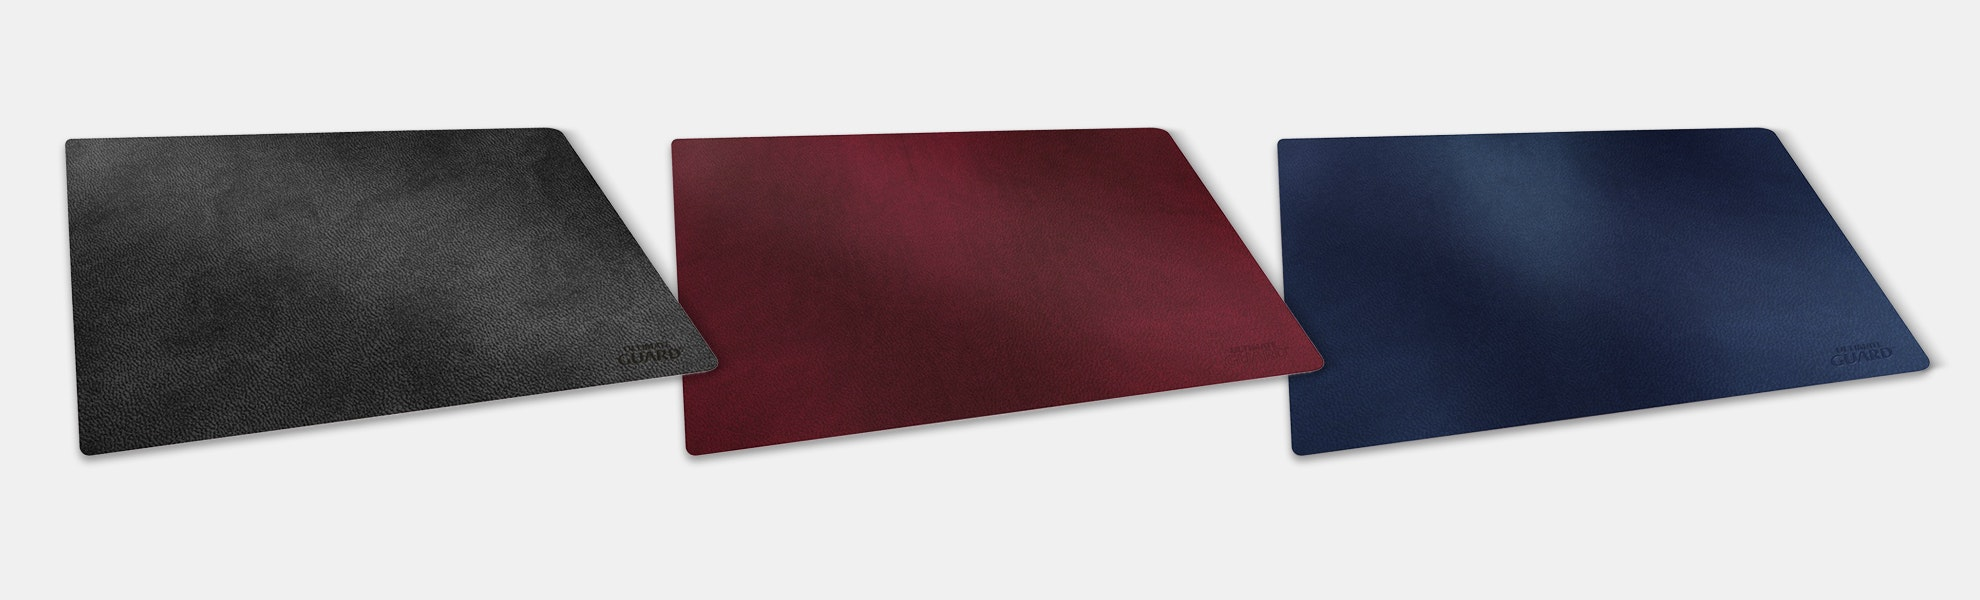 Ultimate Guard SophoSkin Playmat